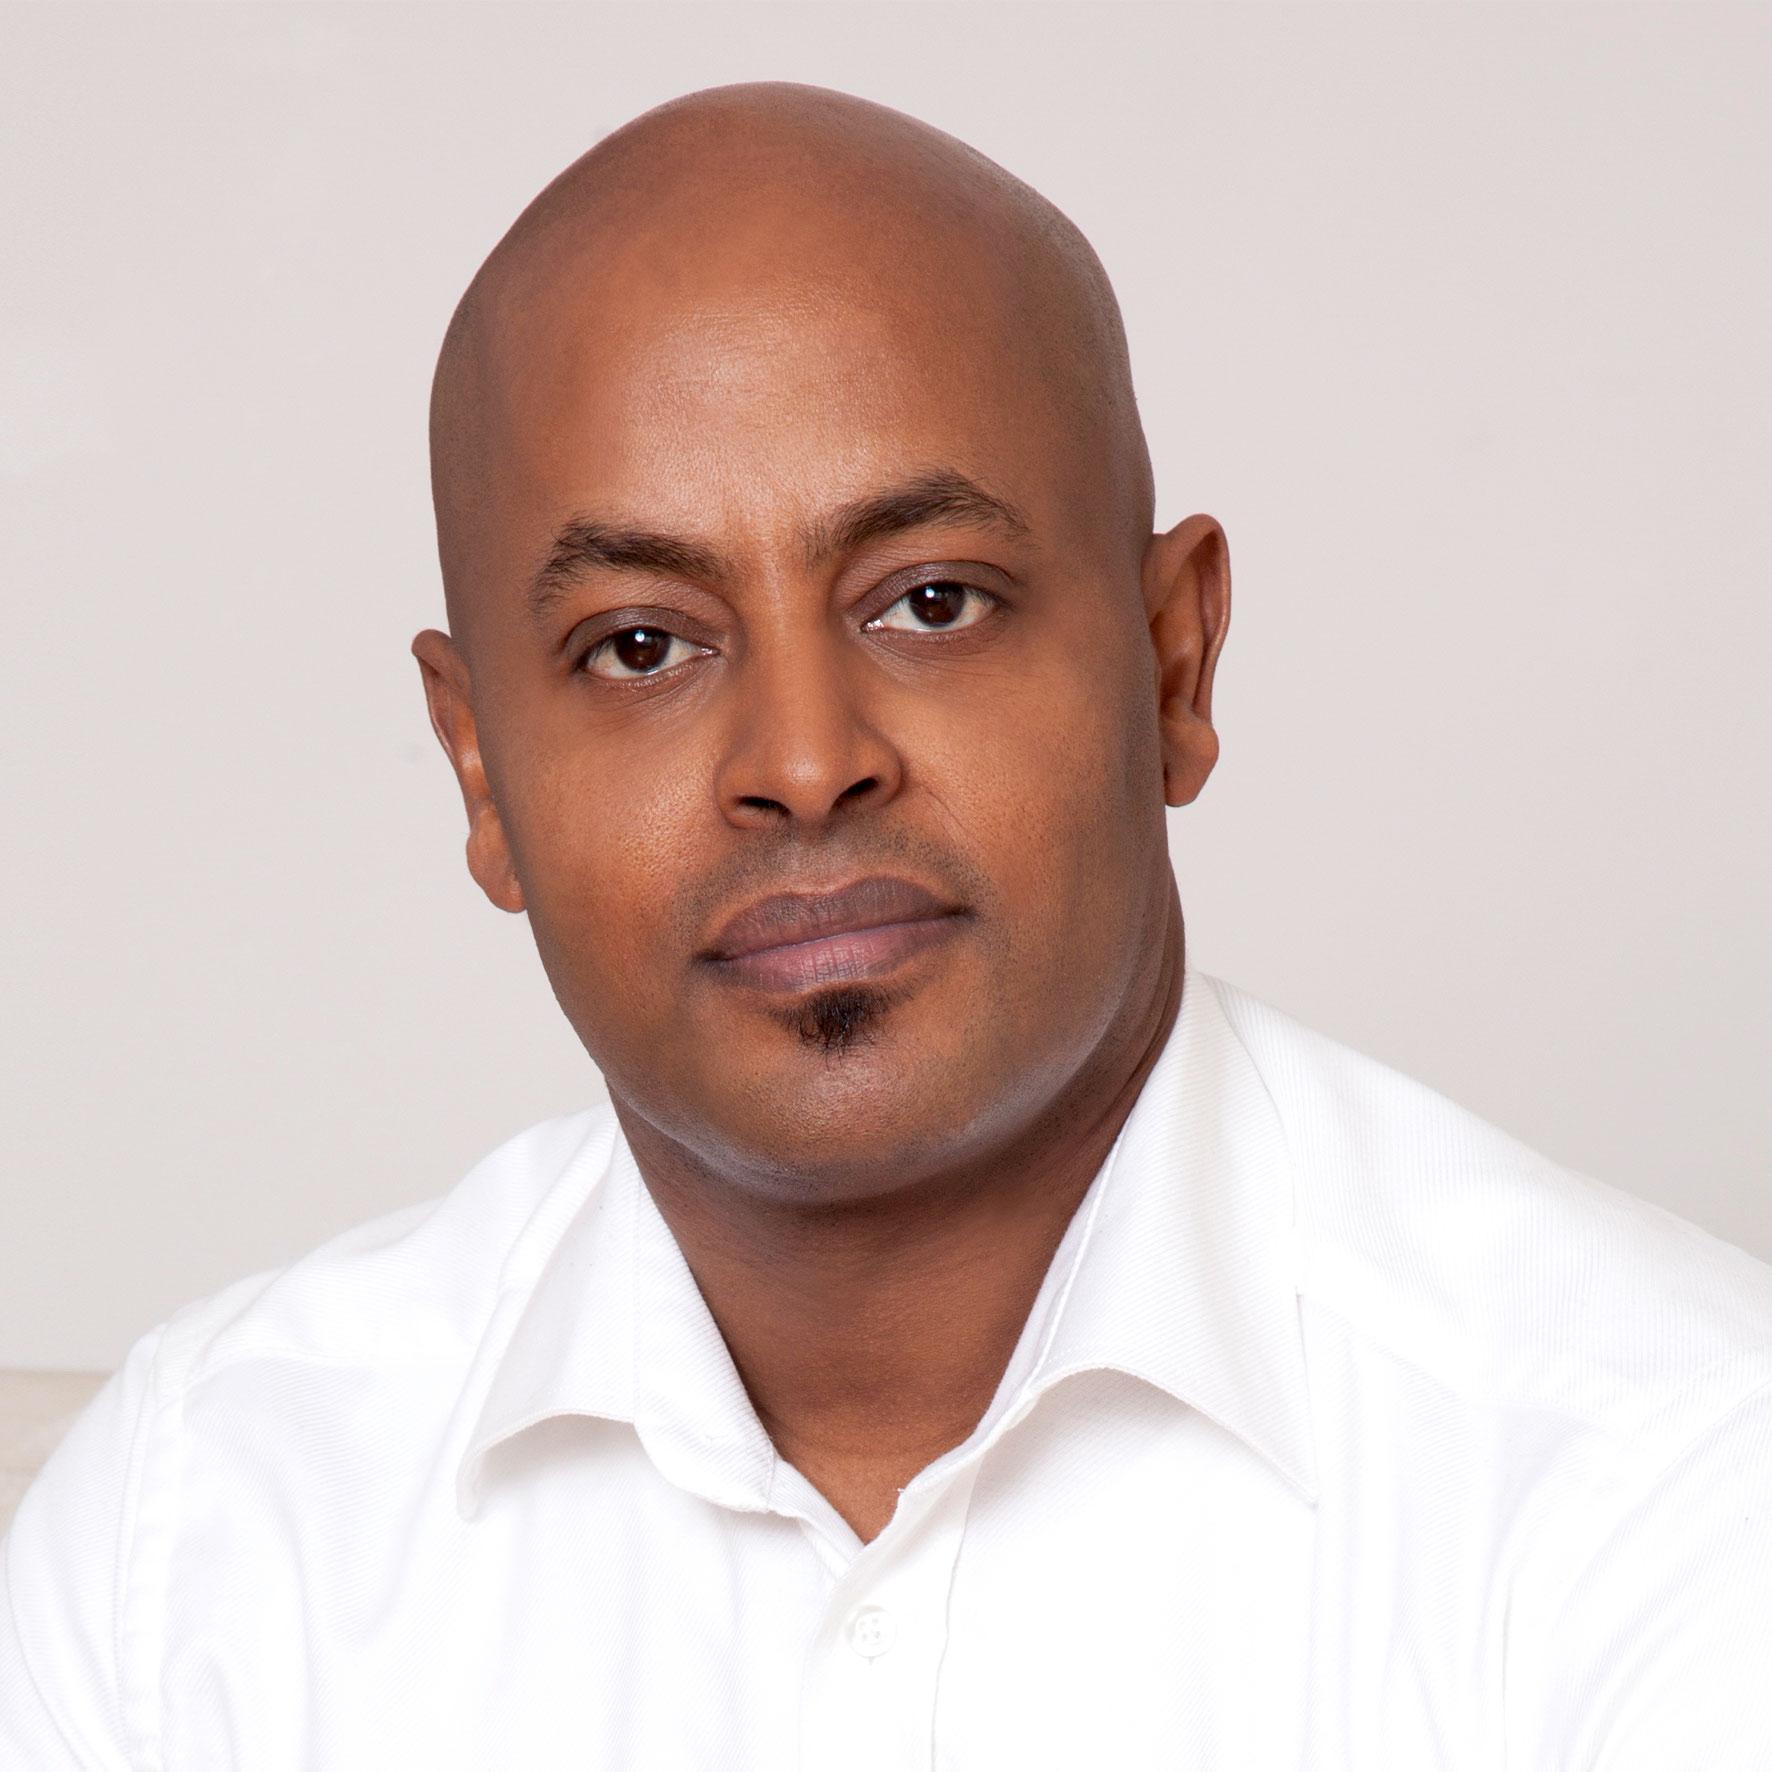 Samuel Tesfay